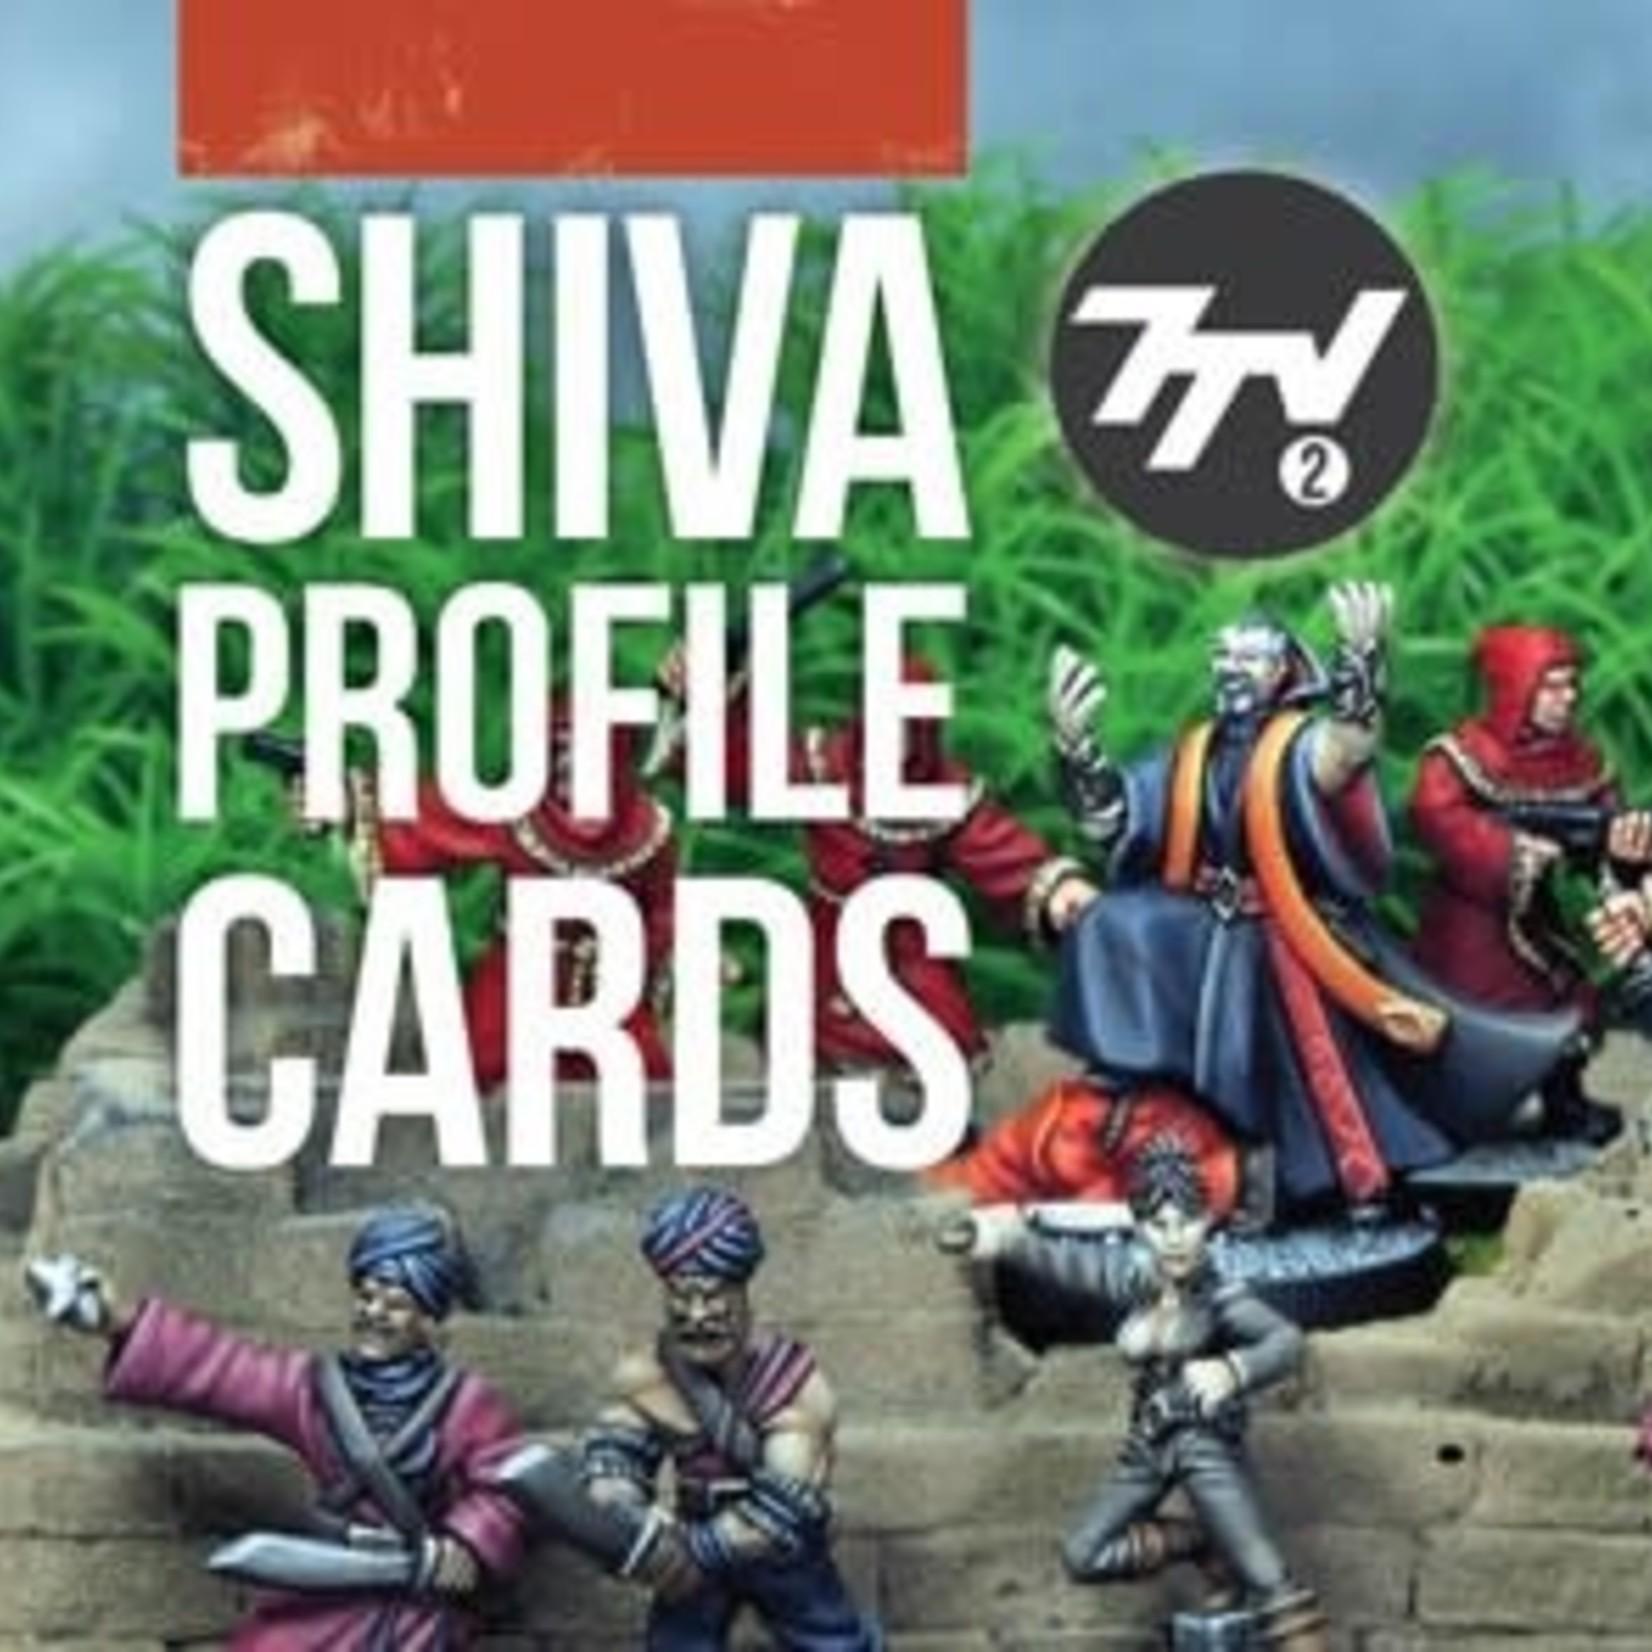 SHIVA Profile Cards